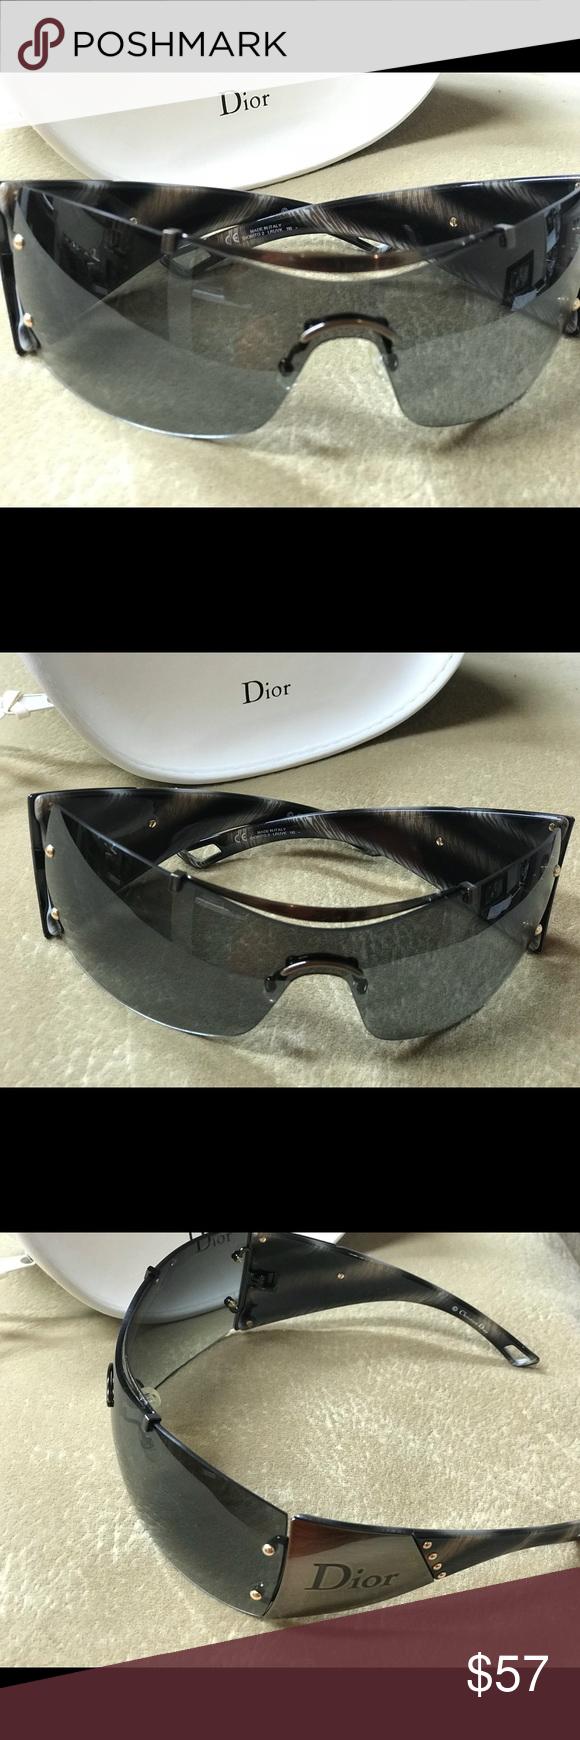 bcc96f8e632 CHRISTIAN DIOR DIORITO 2 Sunglasses LRUVK 110 CHRISTIAN DIOR DIORITO 2  Sunglasses LRUVK 110 grey sand Barely used. The glasses in excellent  pre-owned ...